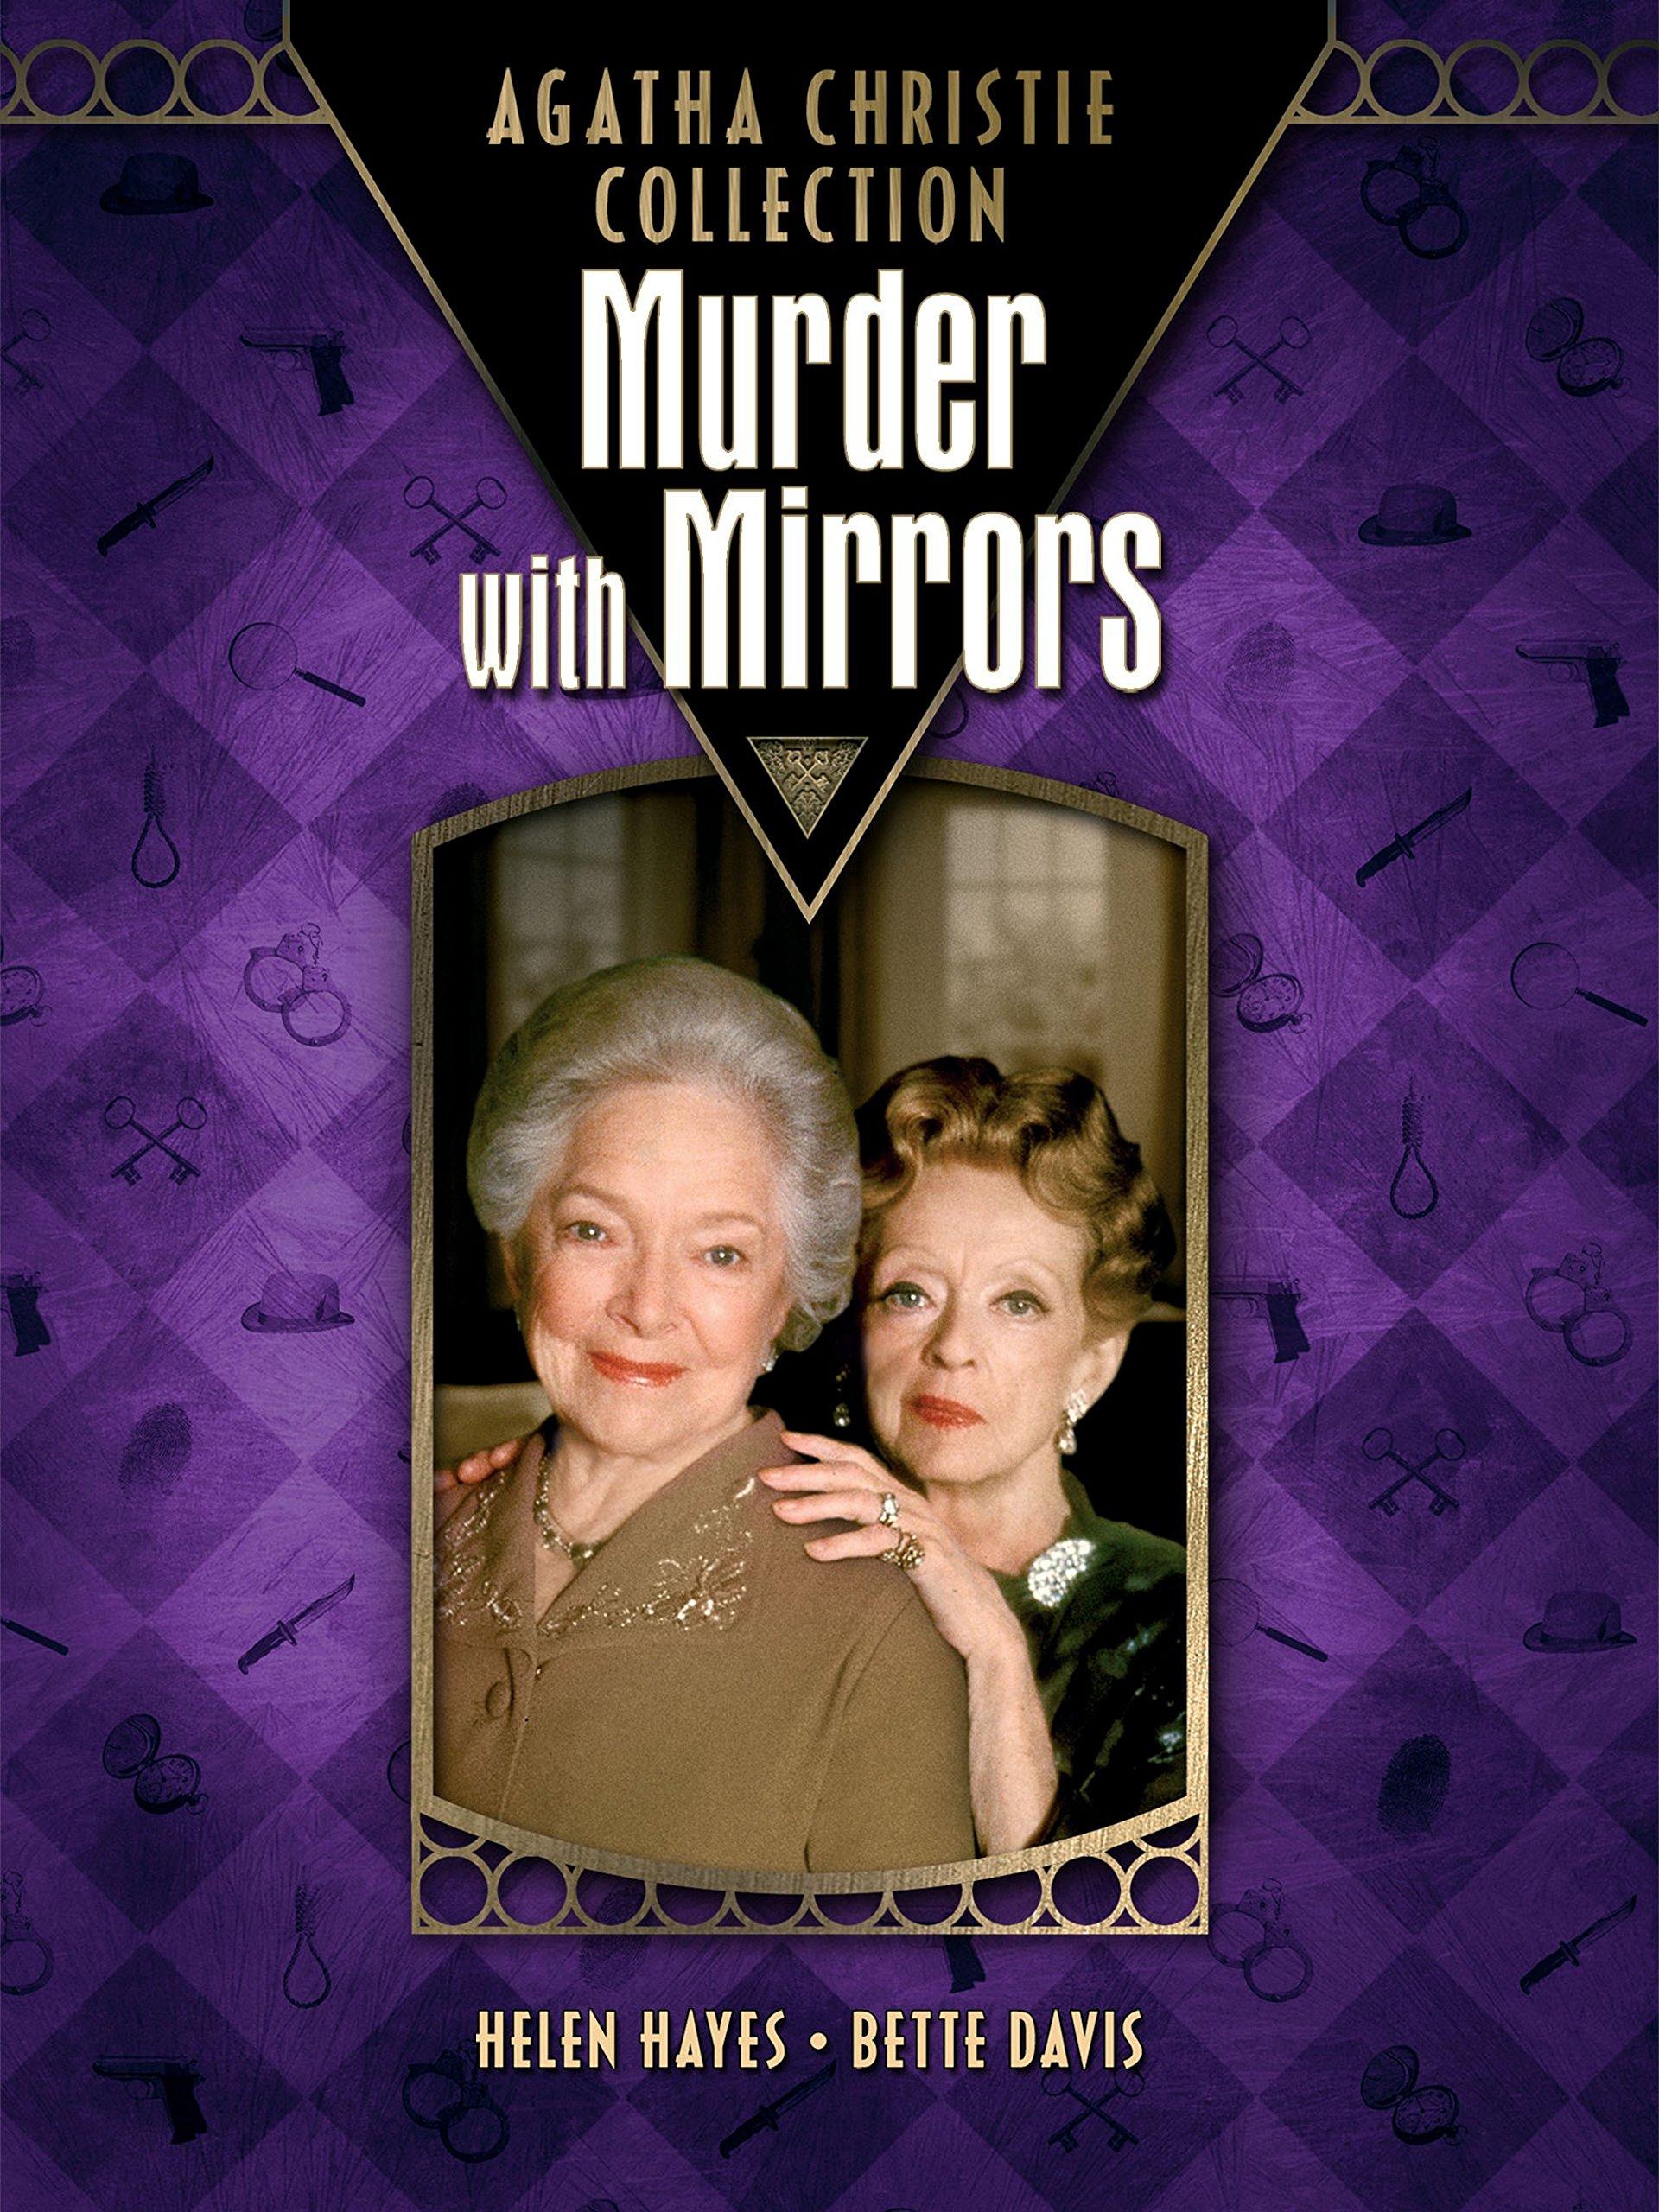 Amazon.com: Murder With Mirrors: Helen Hayes, Bette Davis, John ...